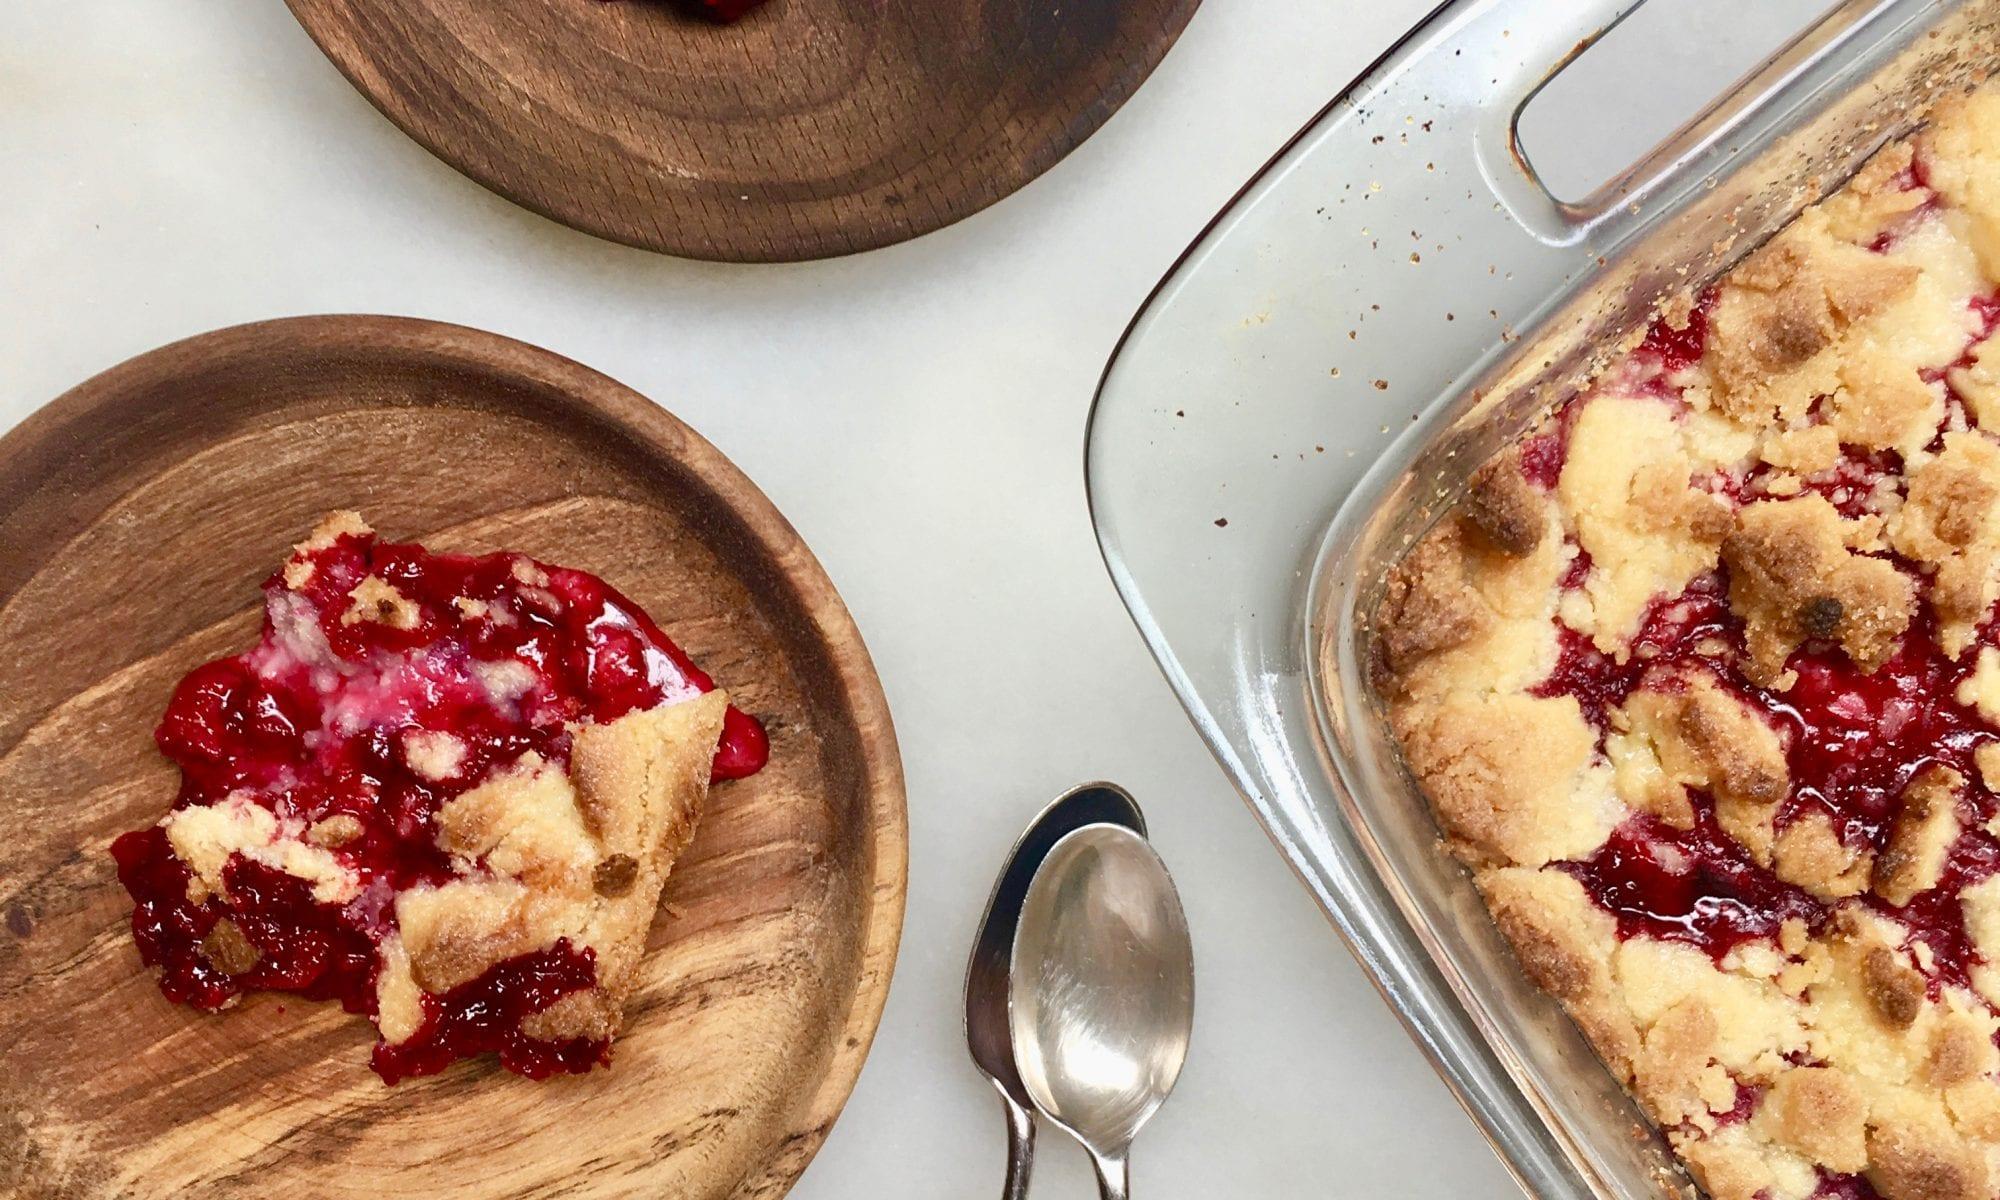 Mixed berry crumble | Jessie Sheehan Bakes